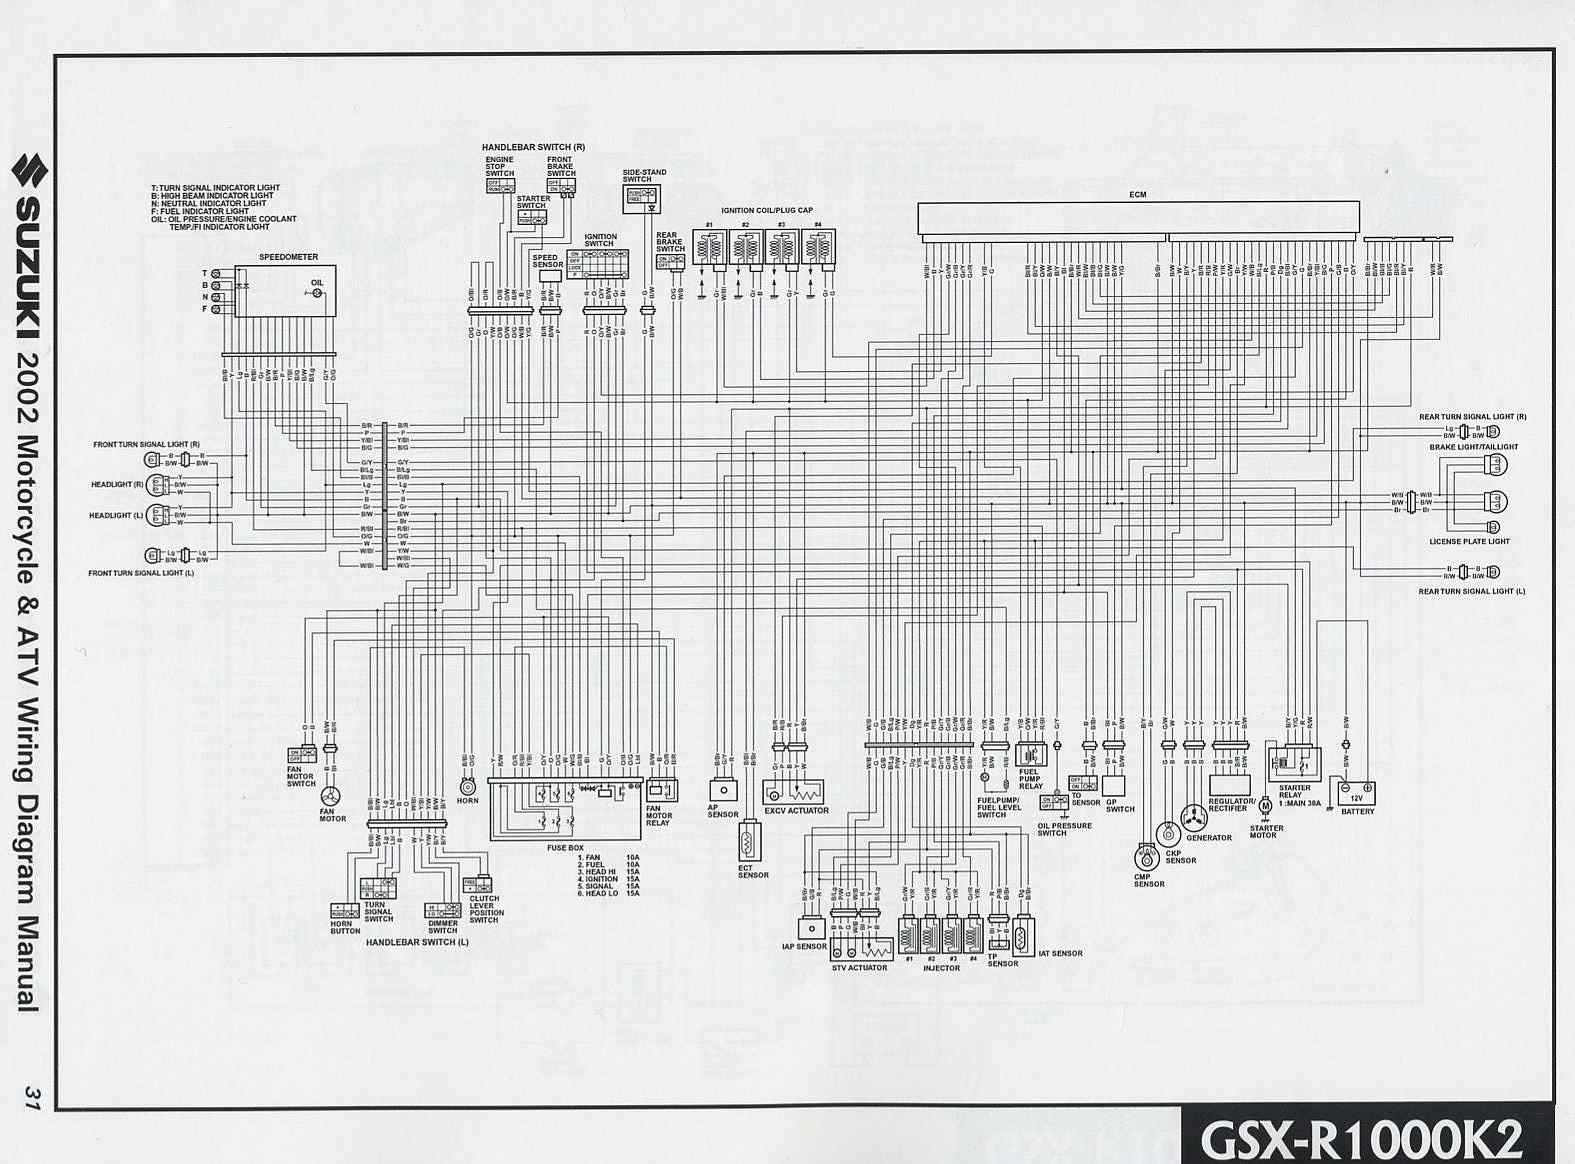 suzuki gsxr 750 2004 service manual